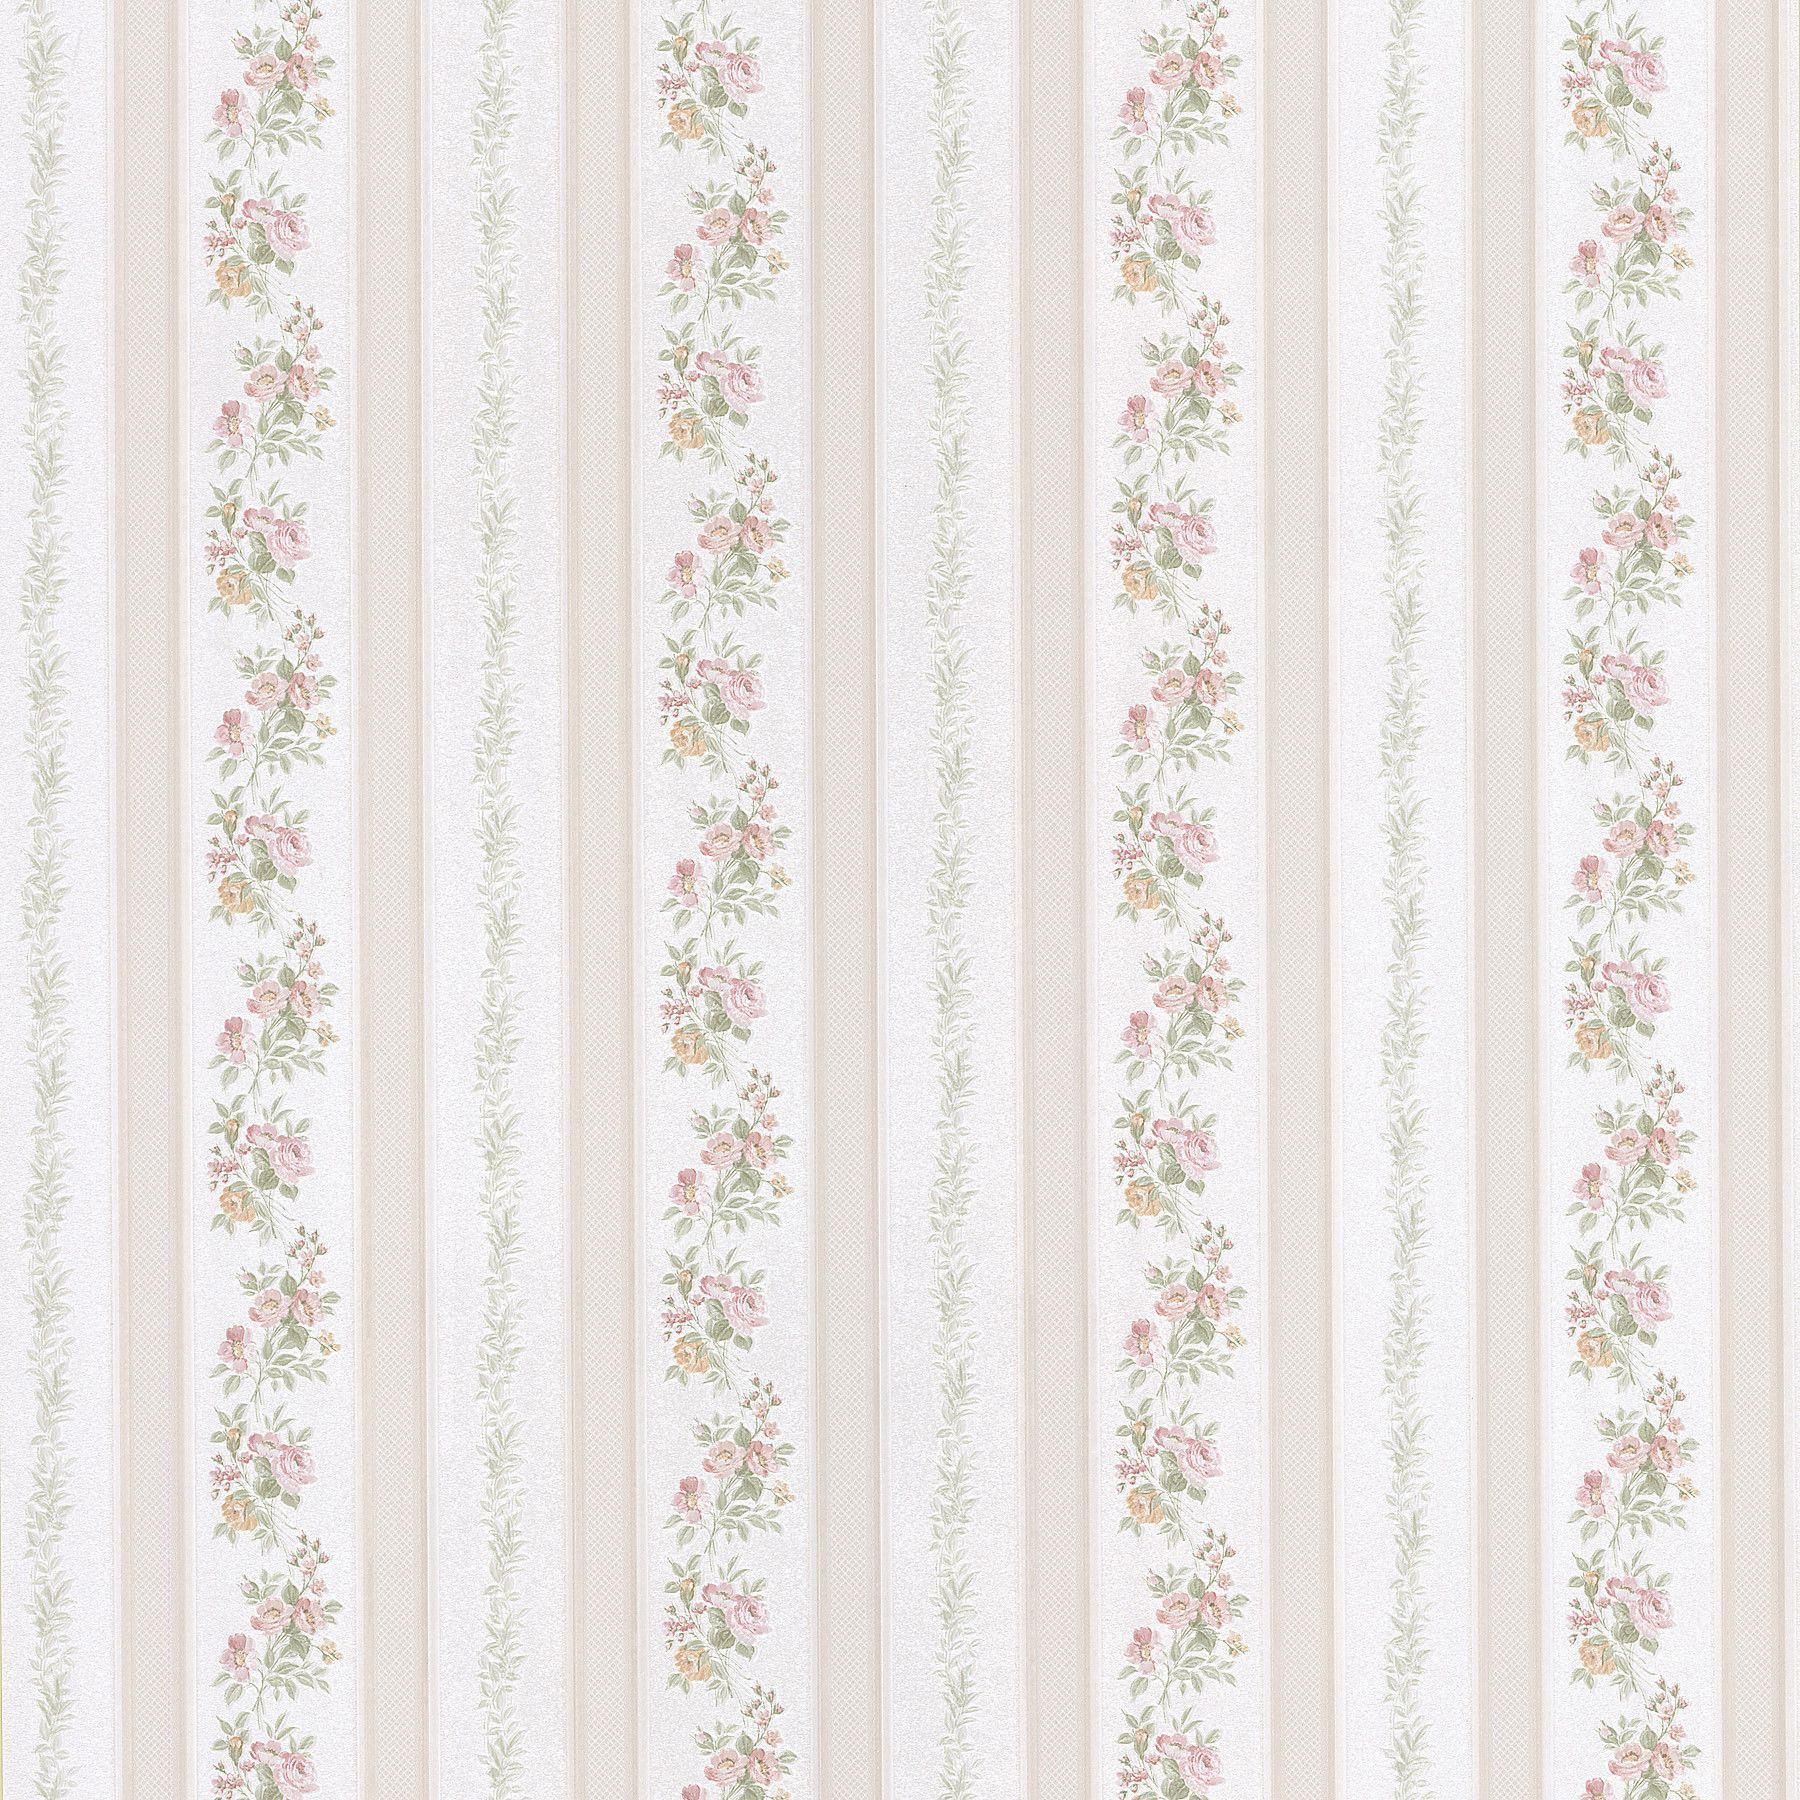 "Bath Bath Bath Volume IV Merle 33' x 20.5"" Floral and Botanical 3D Embossed Wallpaper"